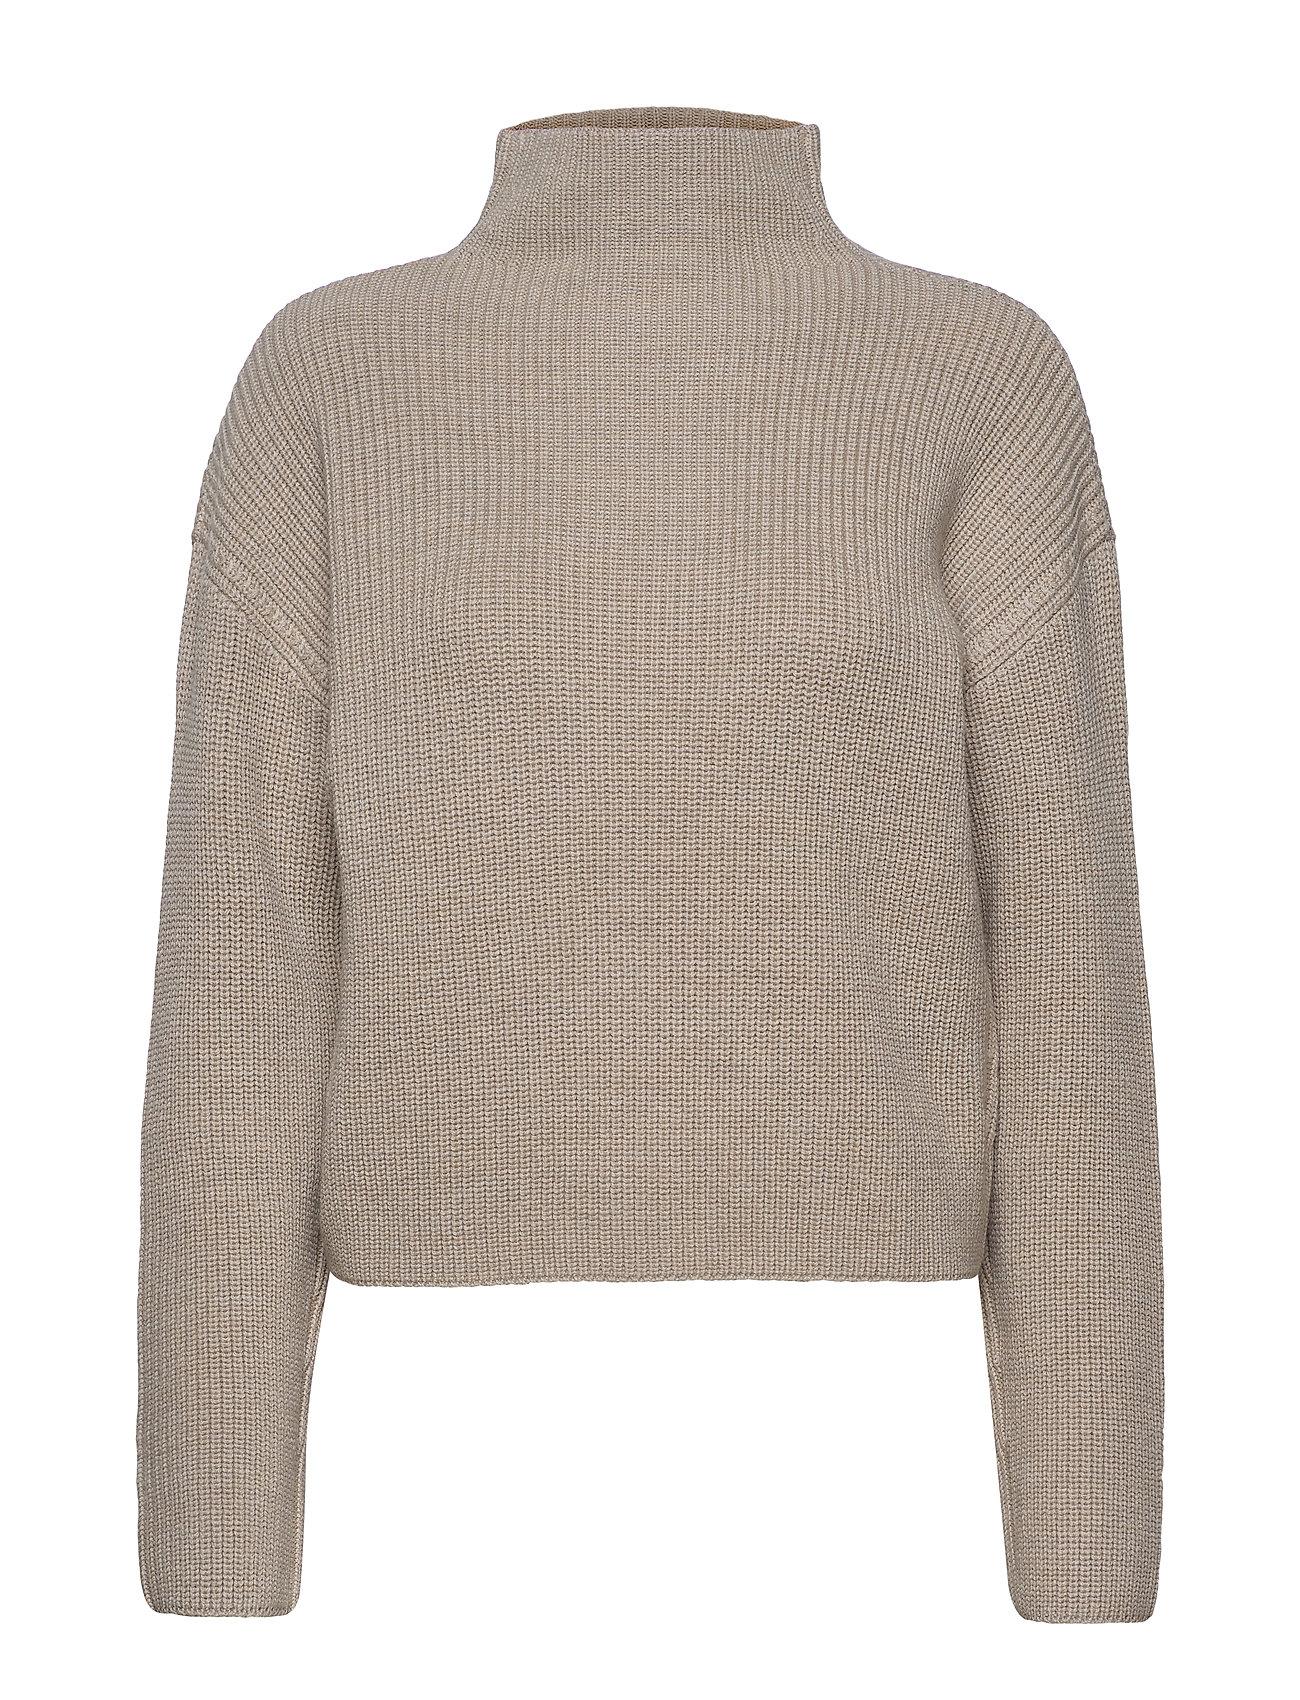 Filippa K Willow Sweater - GREY BEIGE